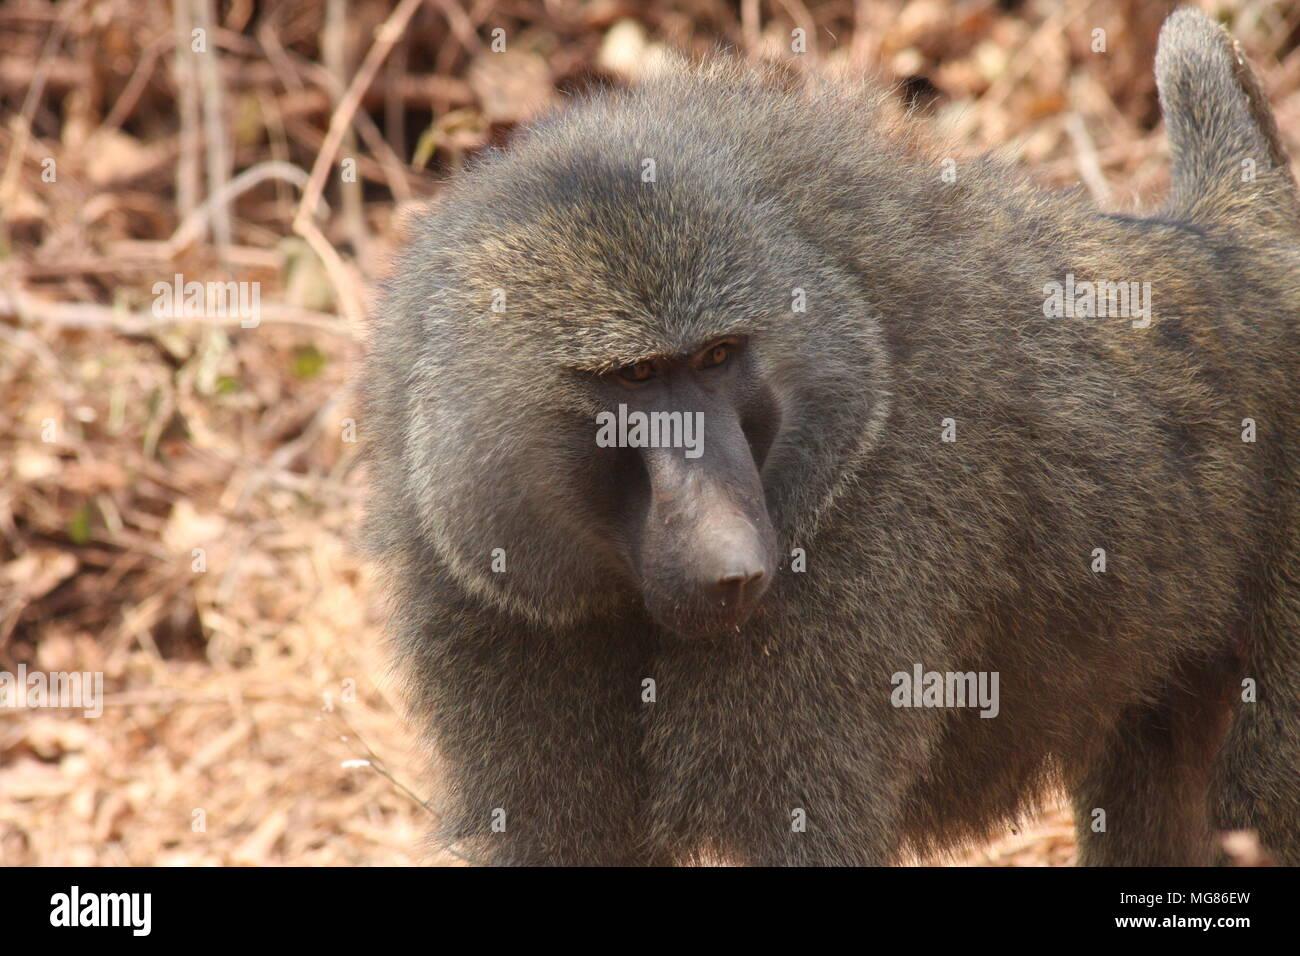 Individual Olive baboon in Tarangire National Park - Stock Image